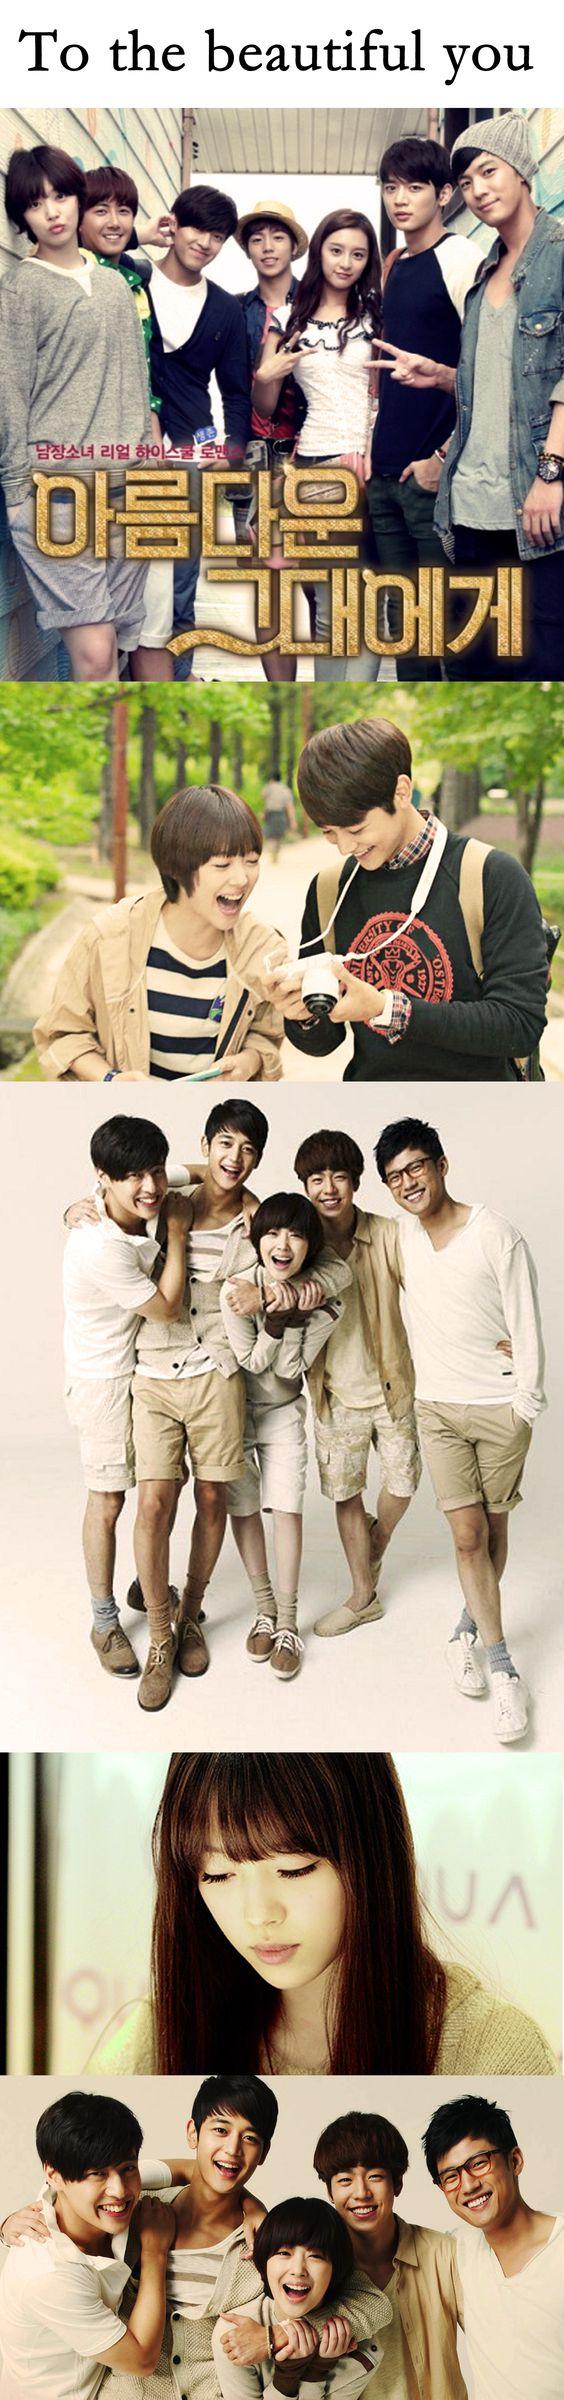 To The Beautiful You (kdrama 2012) - 16 episodes - Choi Minho / Choi Sulli / Lee Hyun-woo